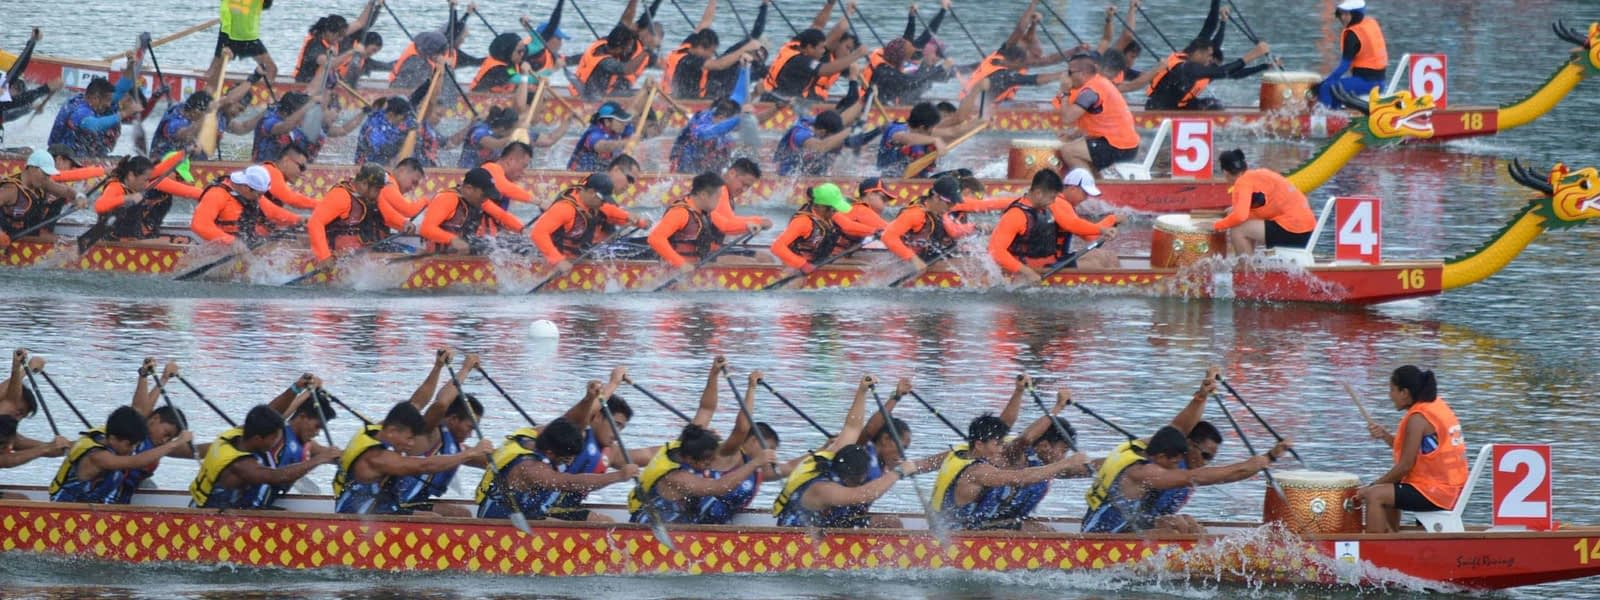 Penang International Dragon Boat Festival 2017